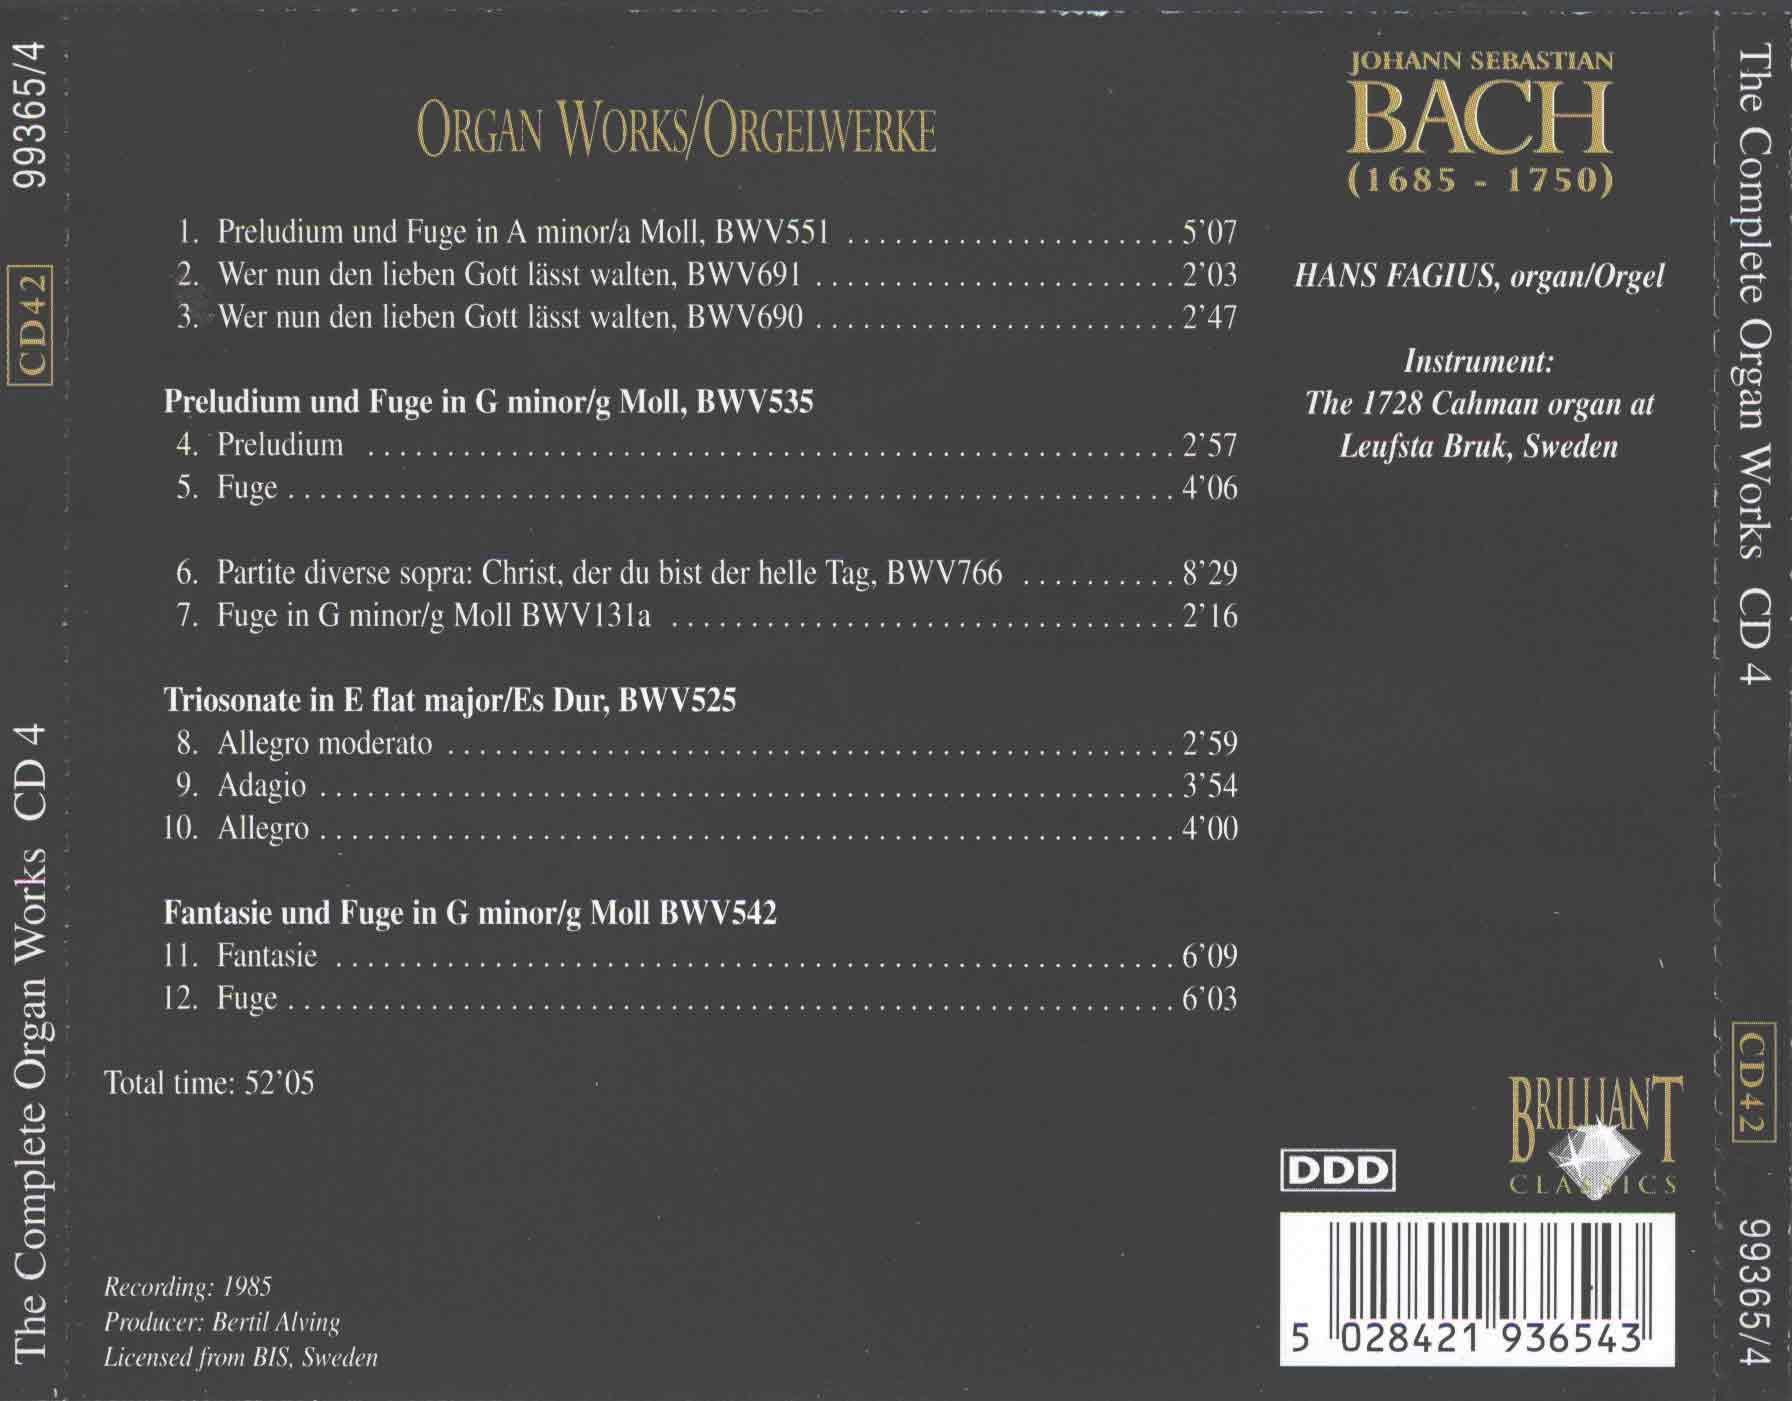 J.S.Bach - The Complete Organ Works CD 4 - Hans Fagius